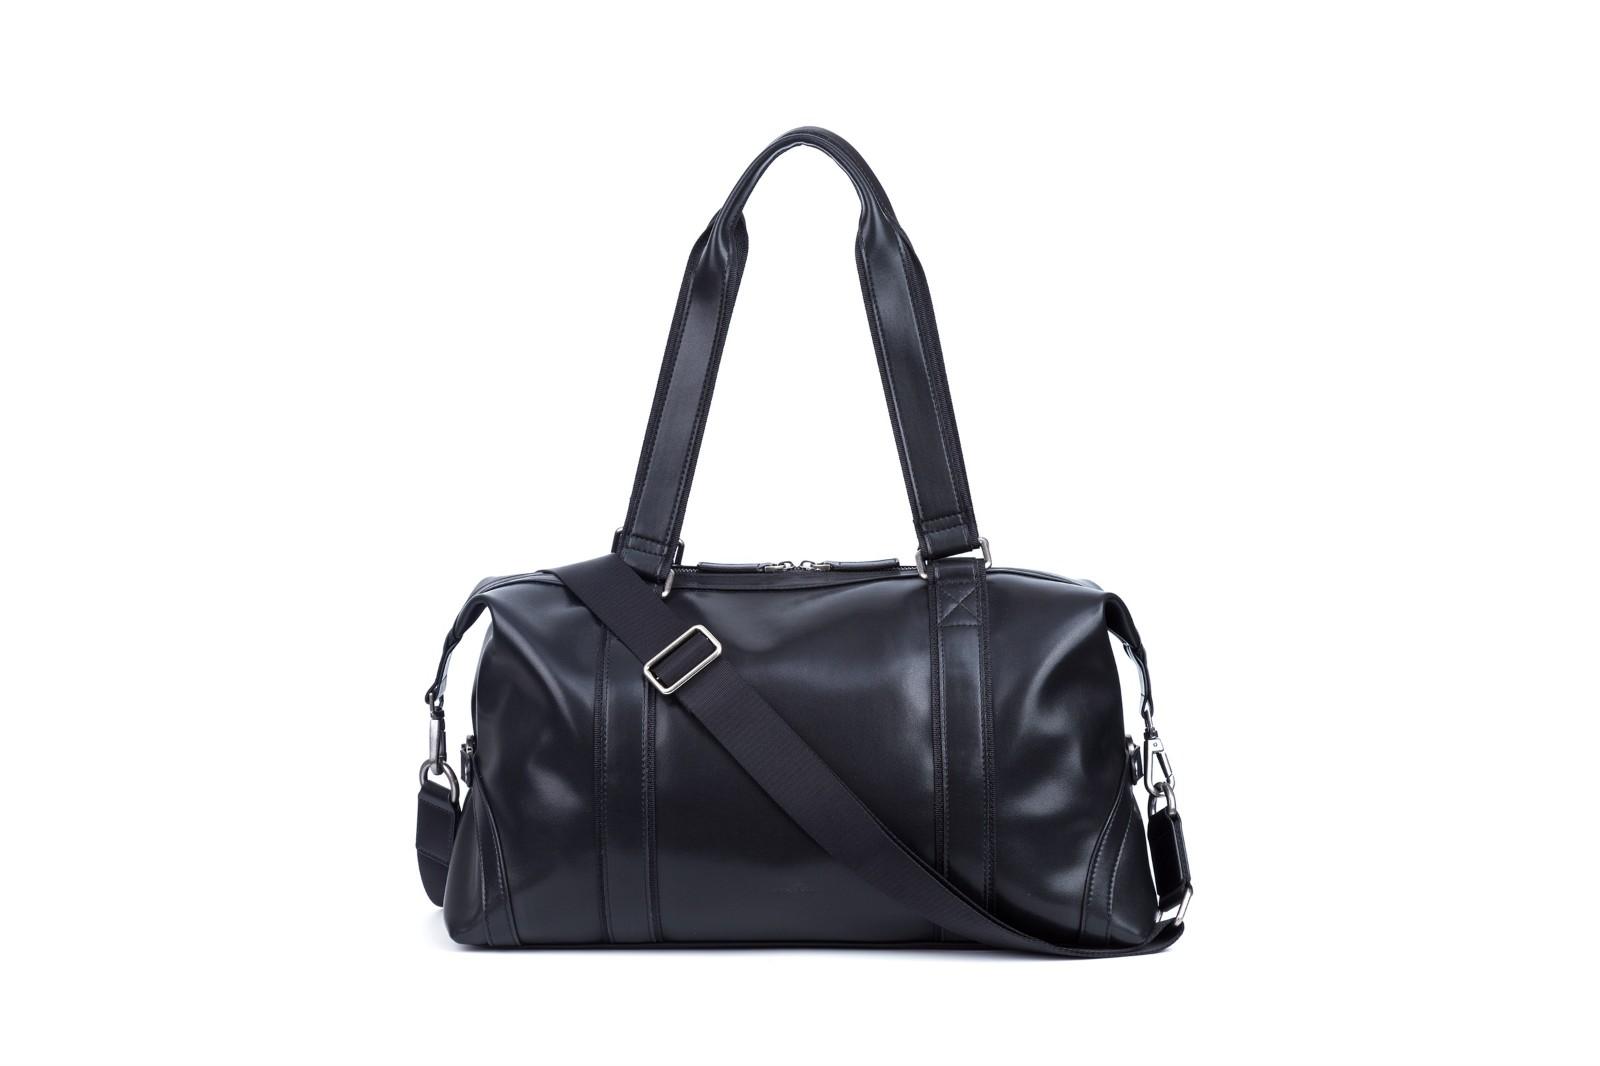 GF bags-Leather Duffle Bag Mens Duffle Leather Handle Metal Zipper Closure-5